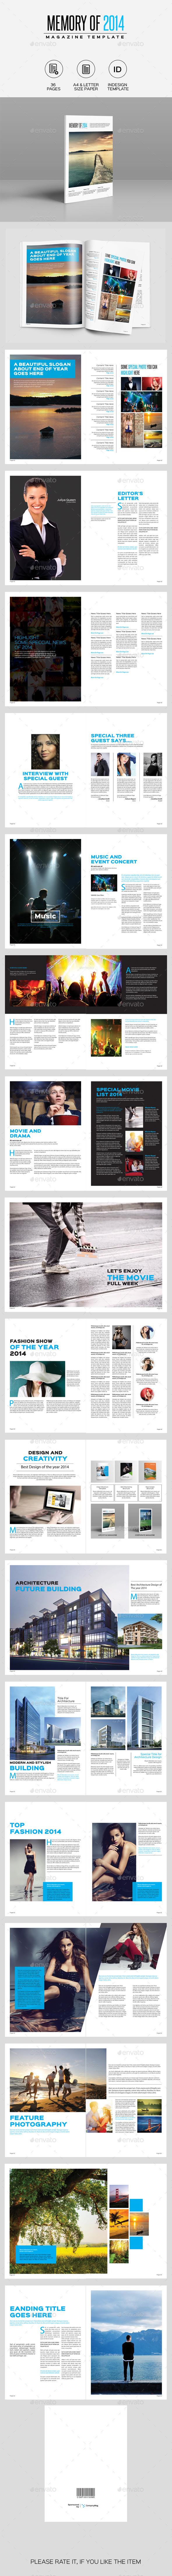 Memory of 2014 Magazine - Magazines Print Templates